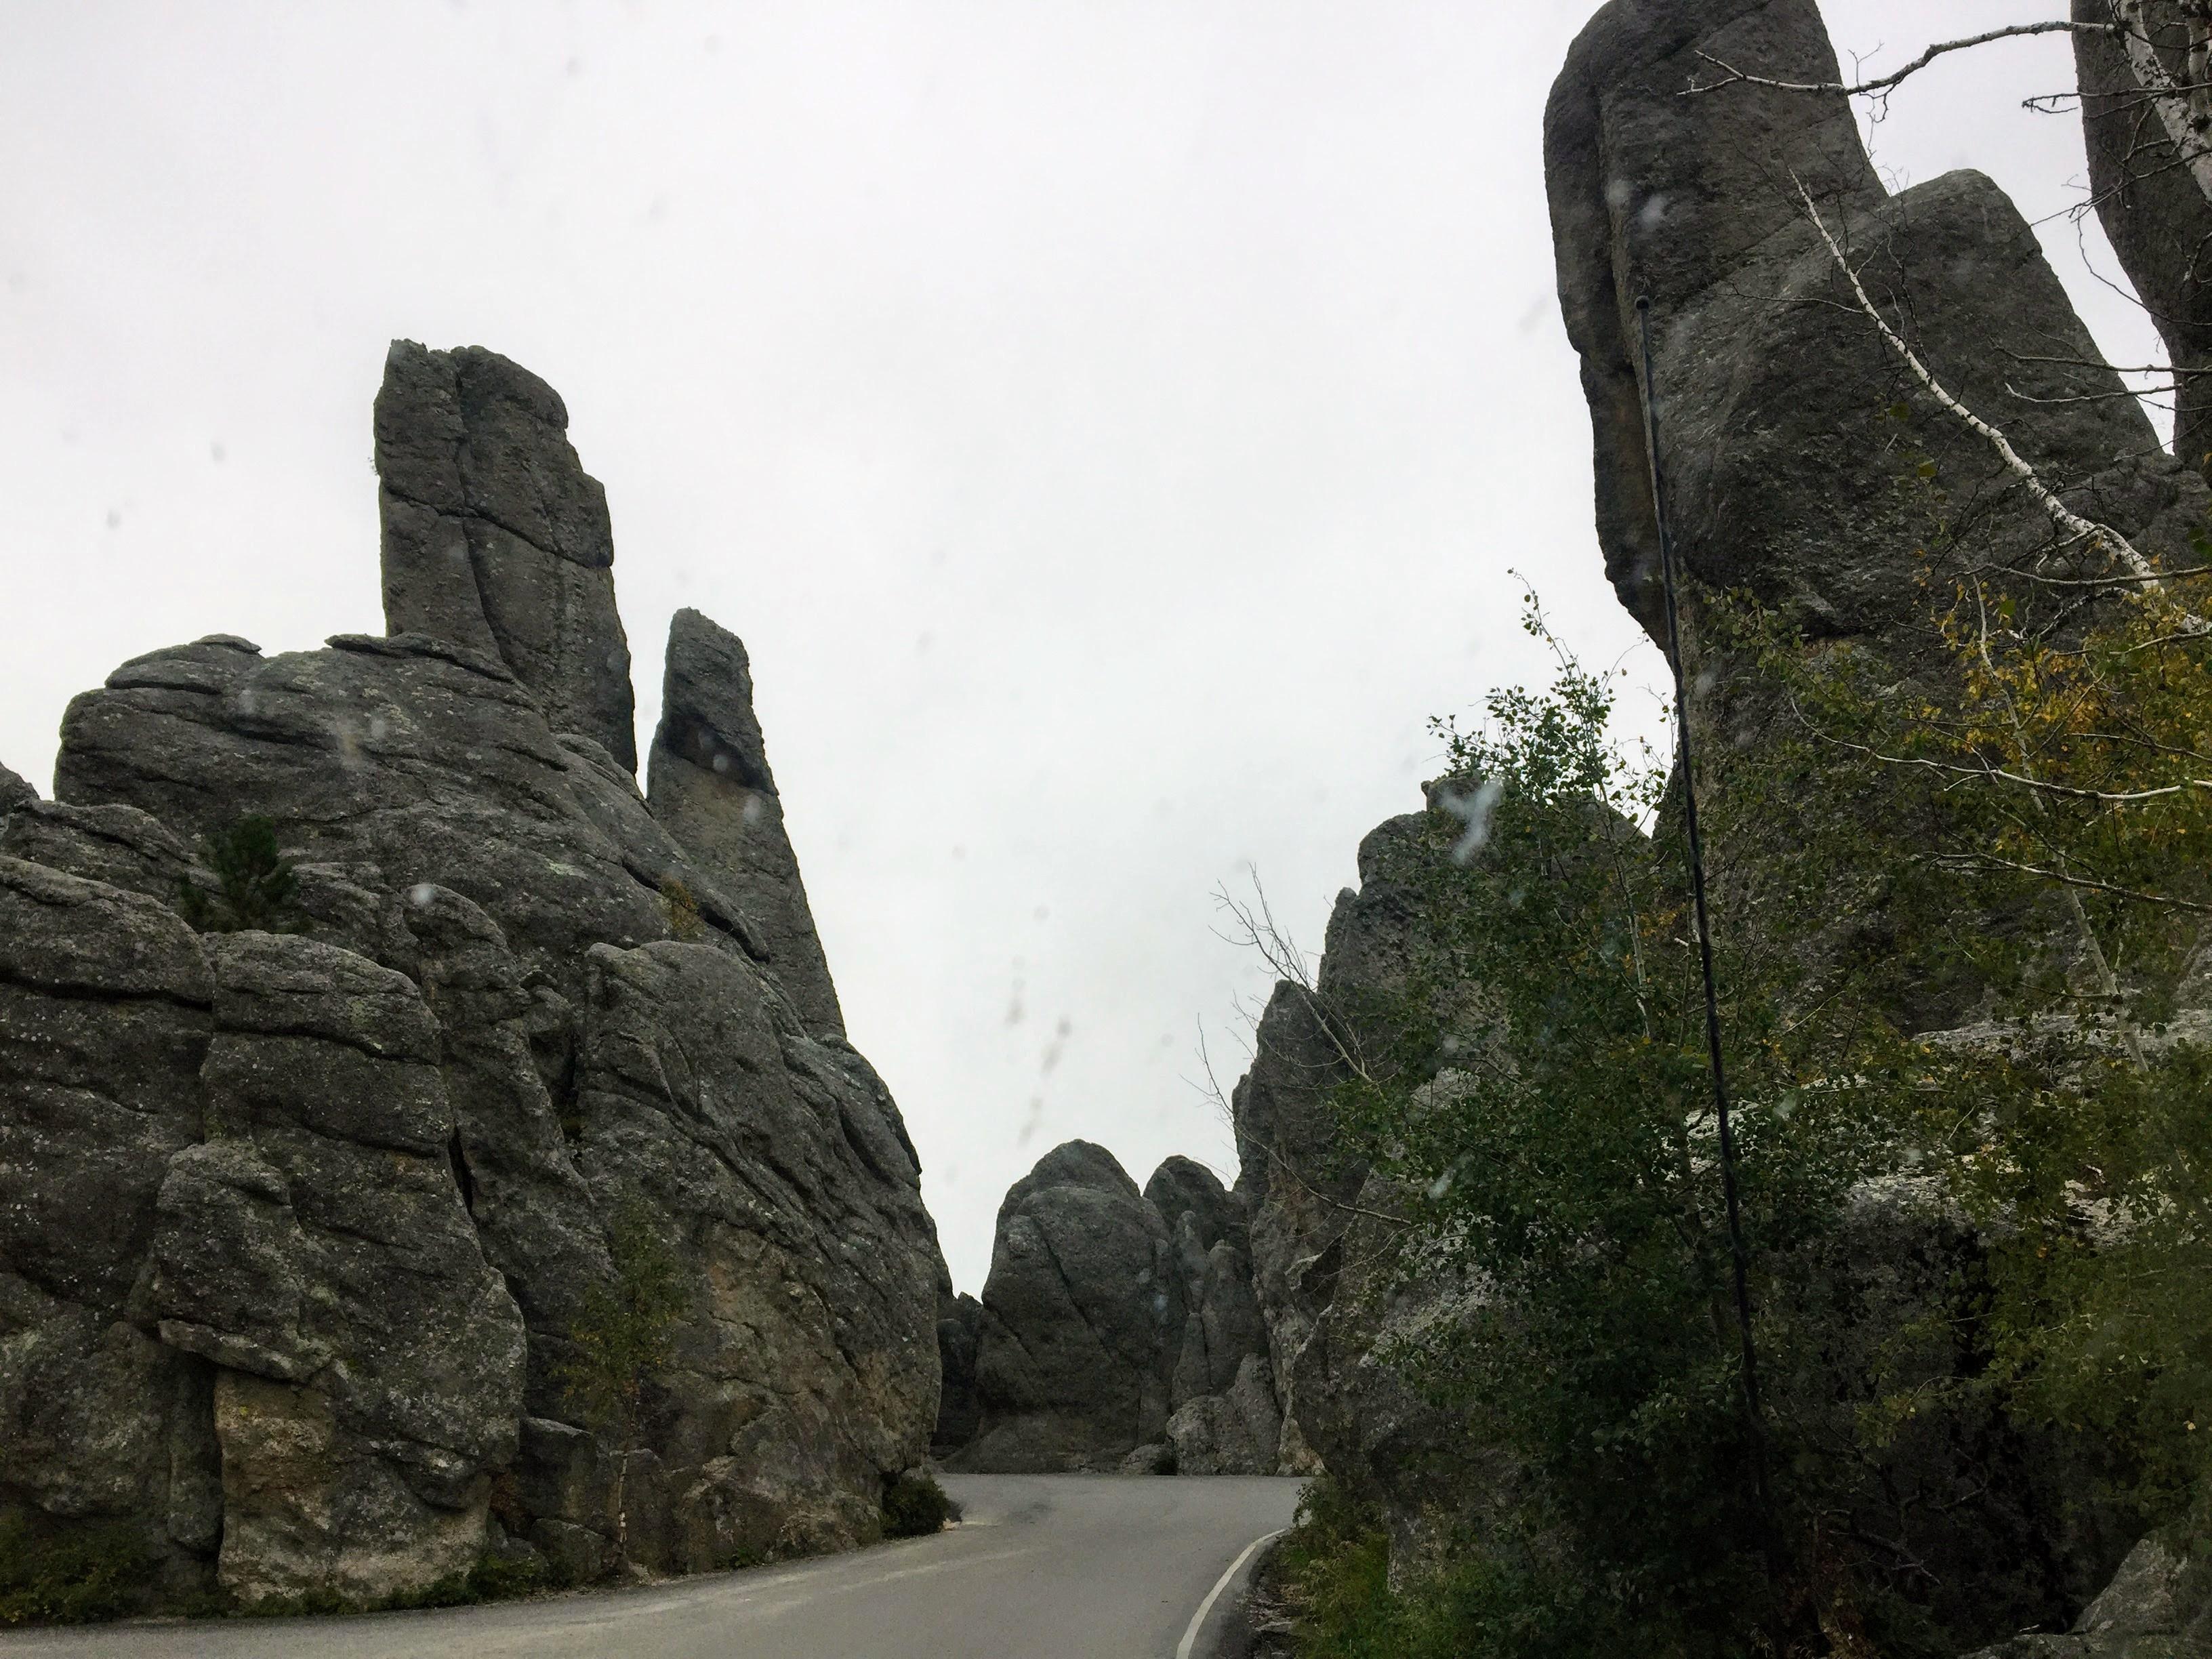 2017-09-17 Black Hills 07 Needles